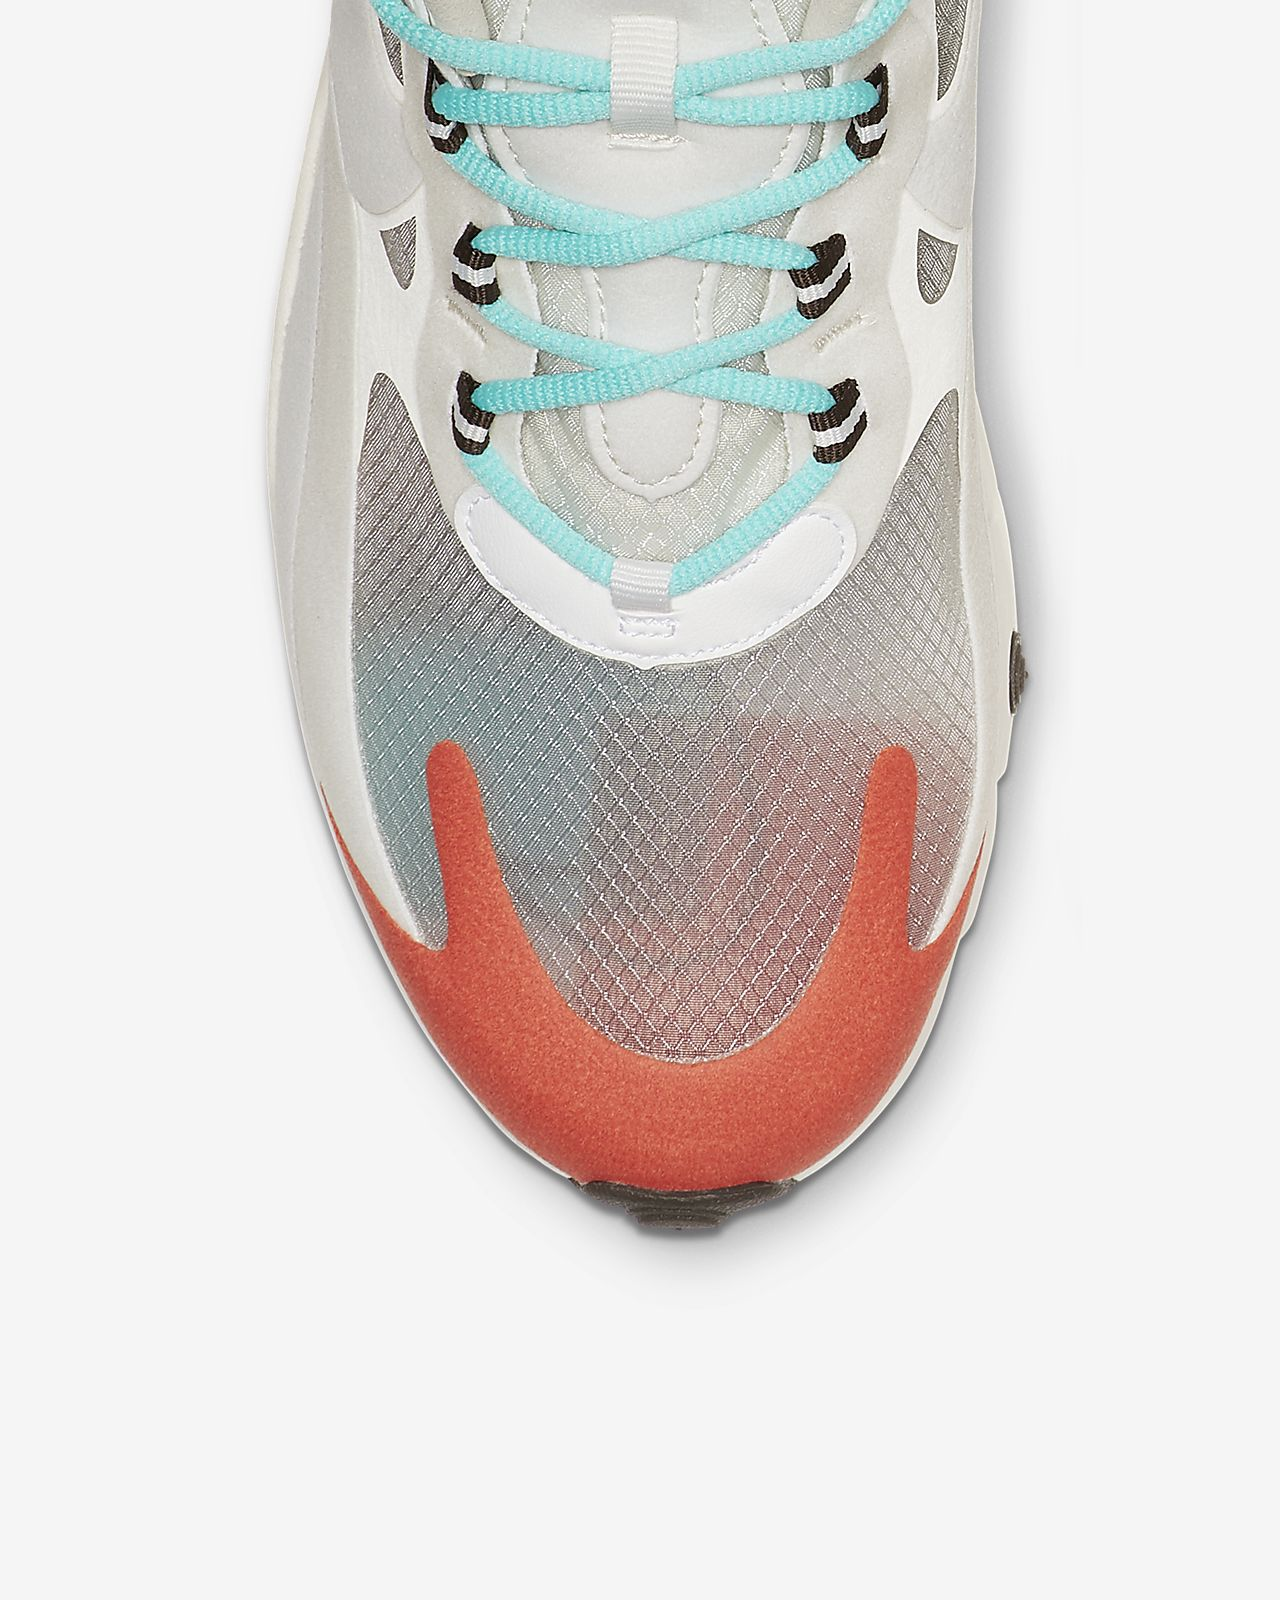 Nike Fresh Air Max Just Do It Boys T Shirt Size L Gray